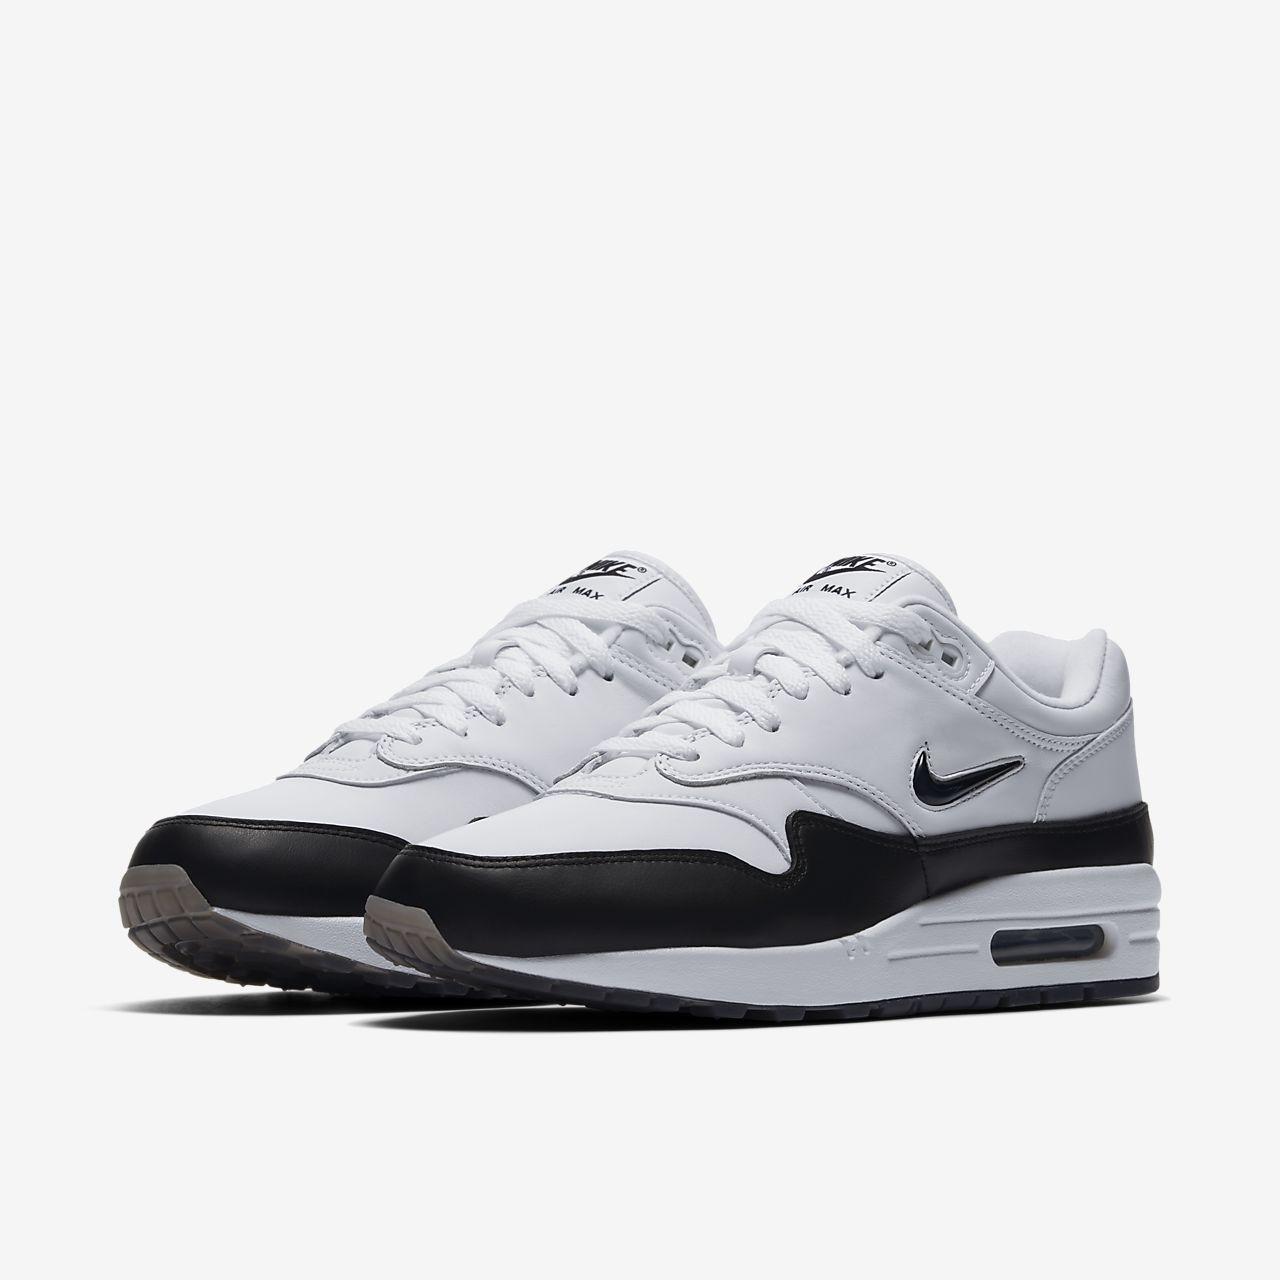 ... Nike Air Max 1 Premium SC Men's Shoe